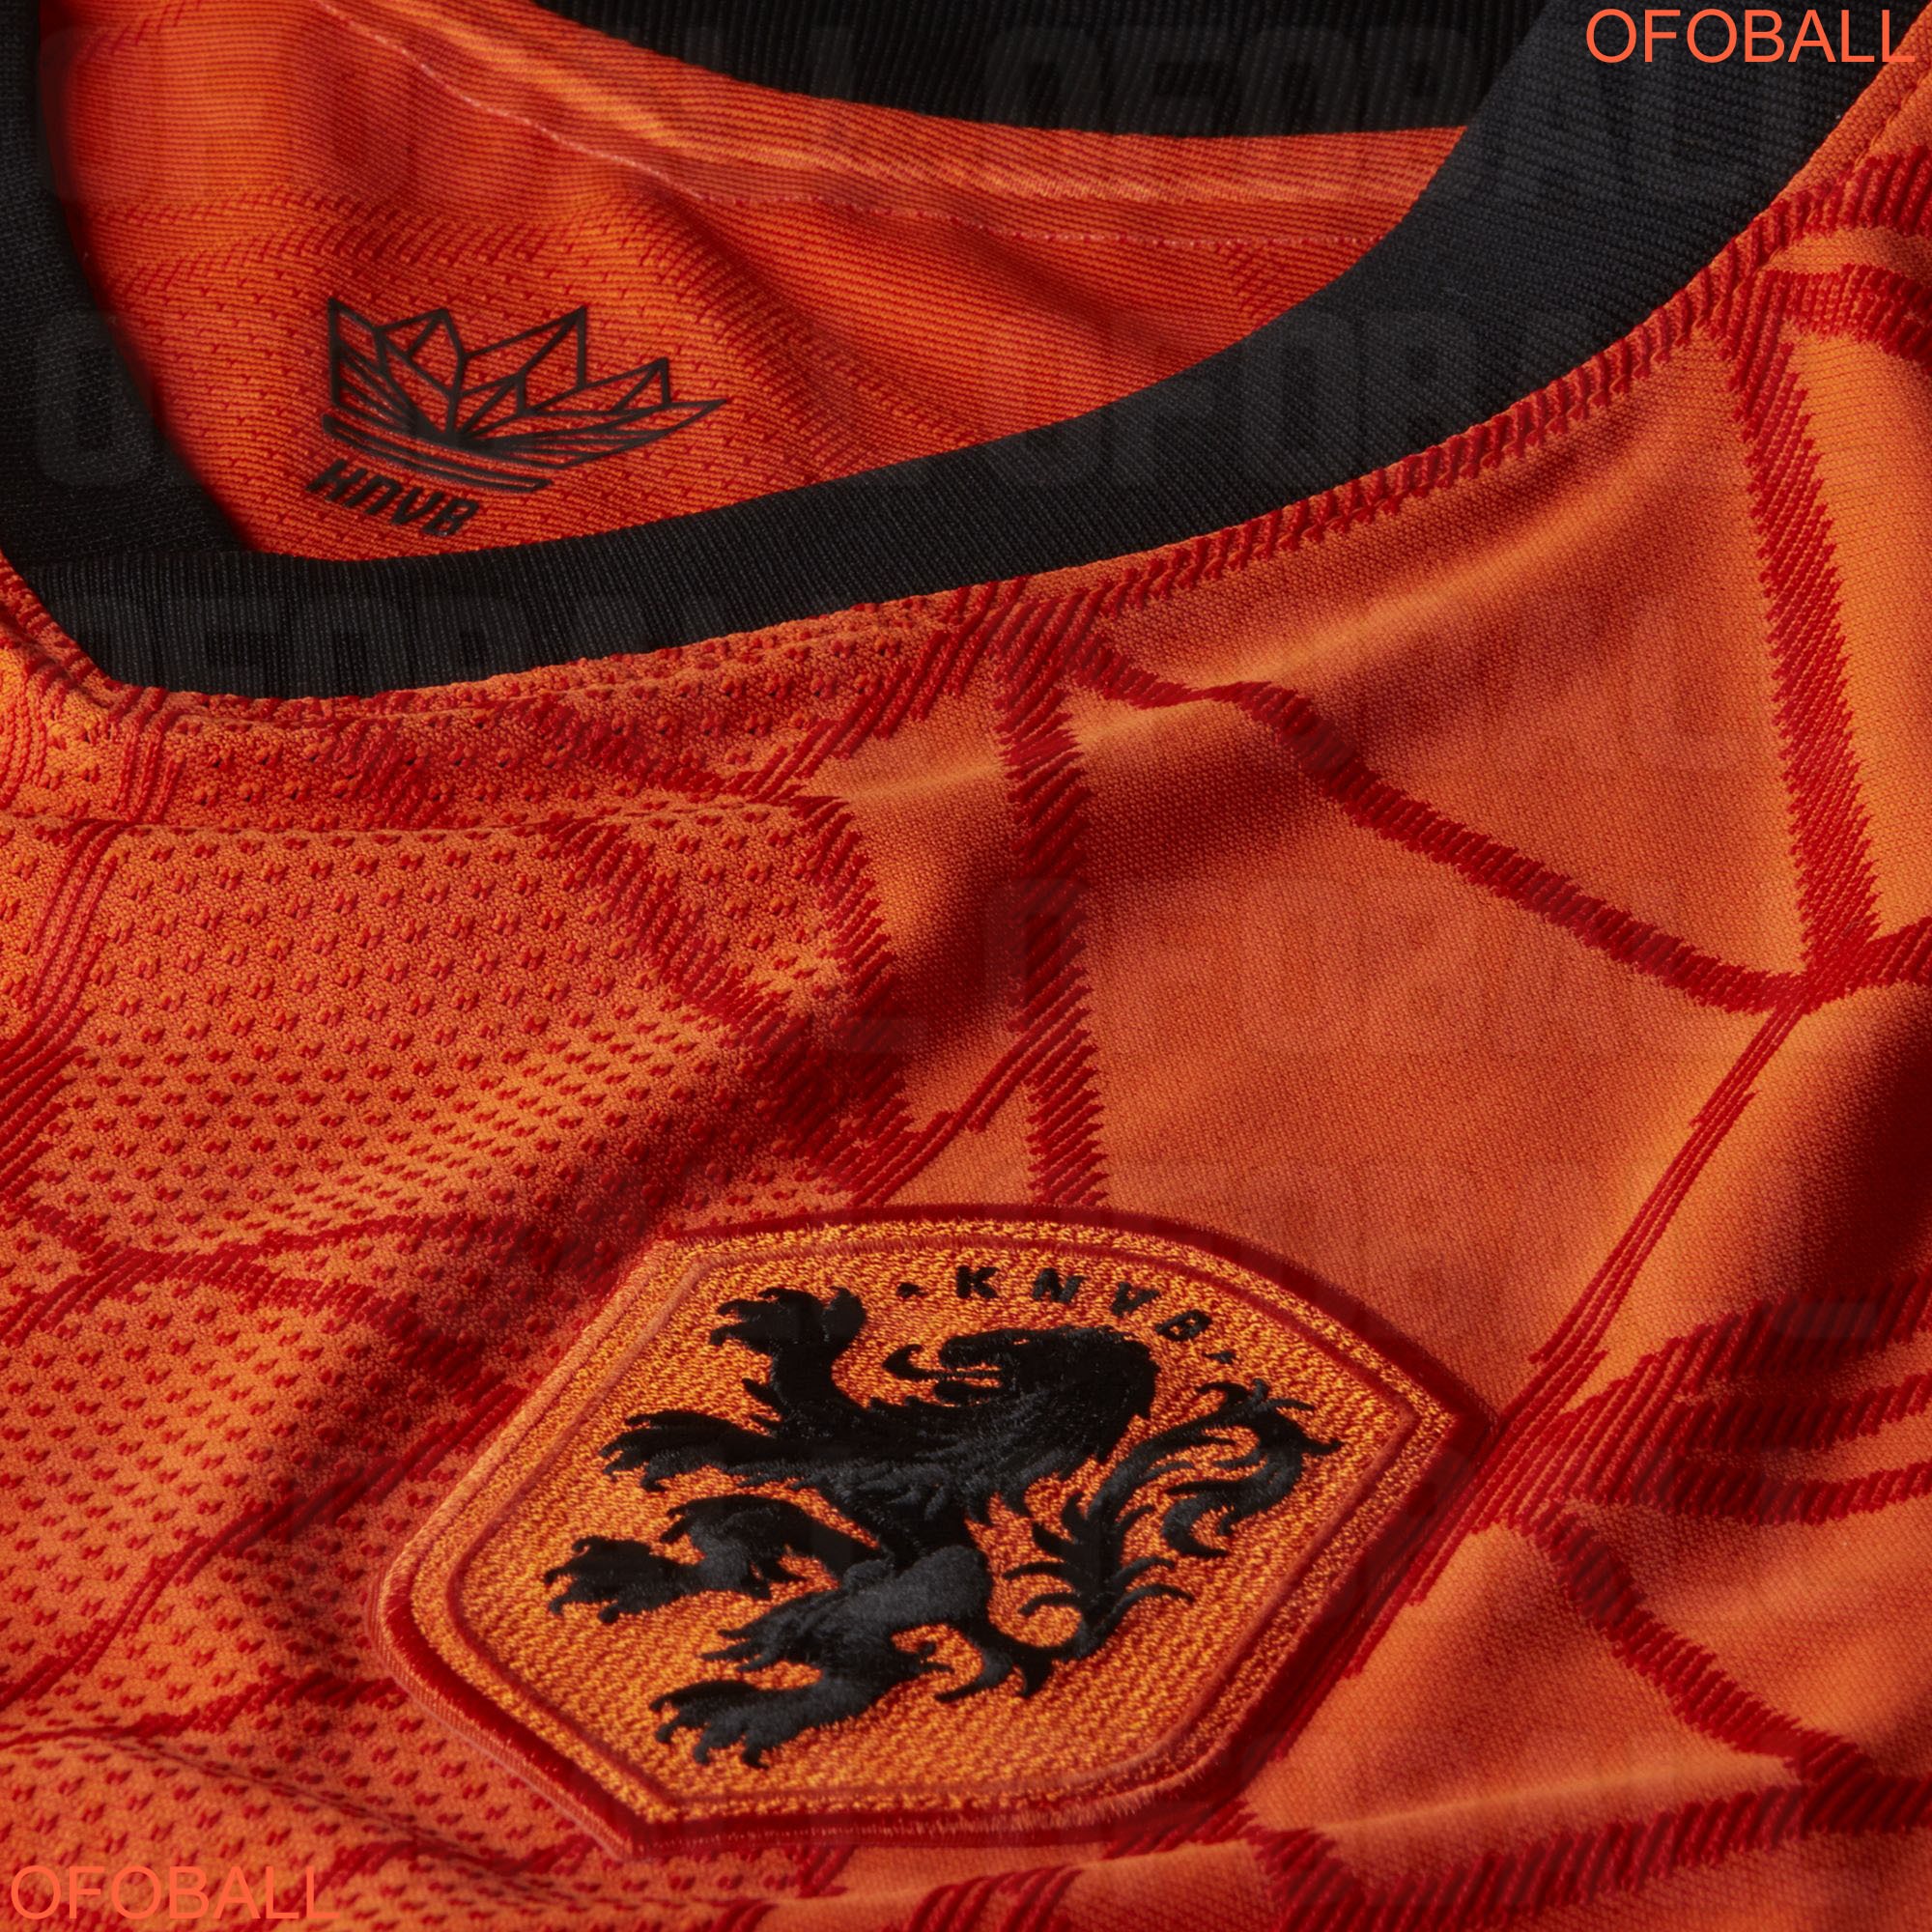 Pays-Bas Euro 2020 maillot domicile detail blason